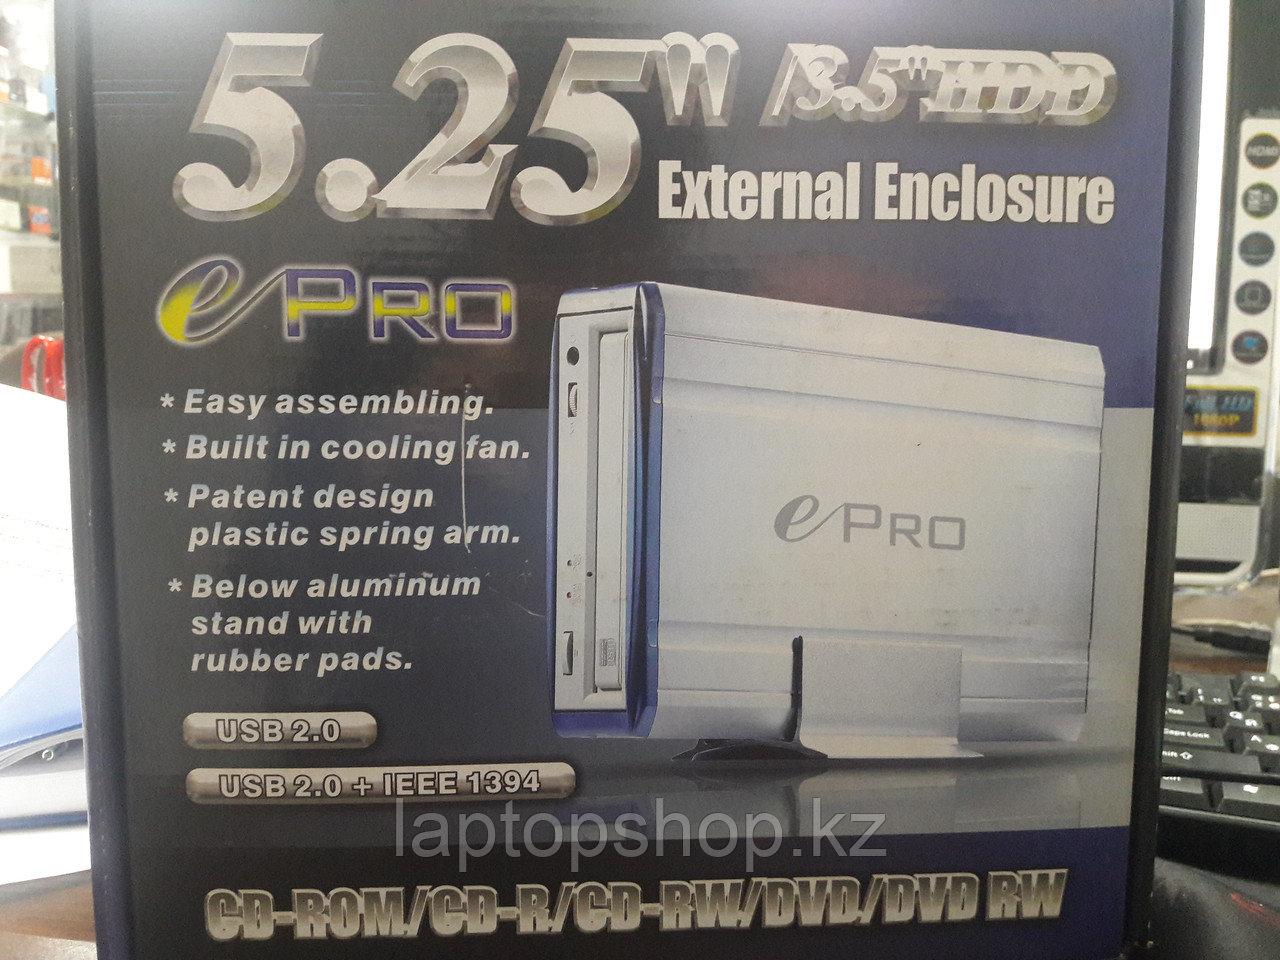 "Внешний корпус ePRO Ext Case for 5.25""CDROM/DVD/CDRW"